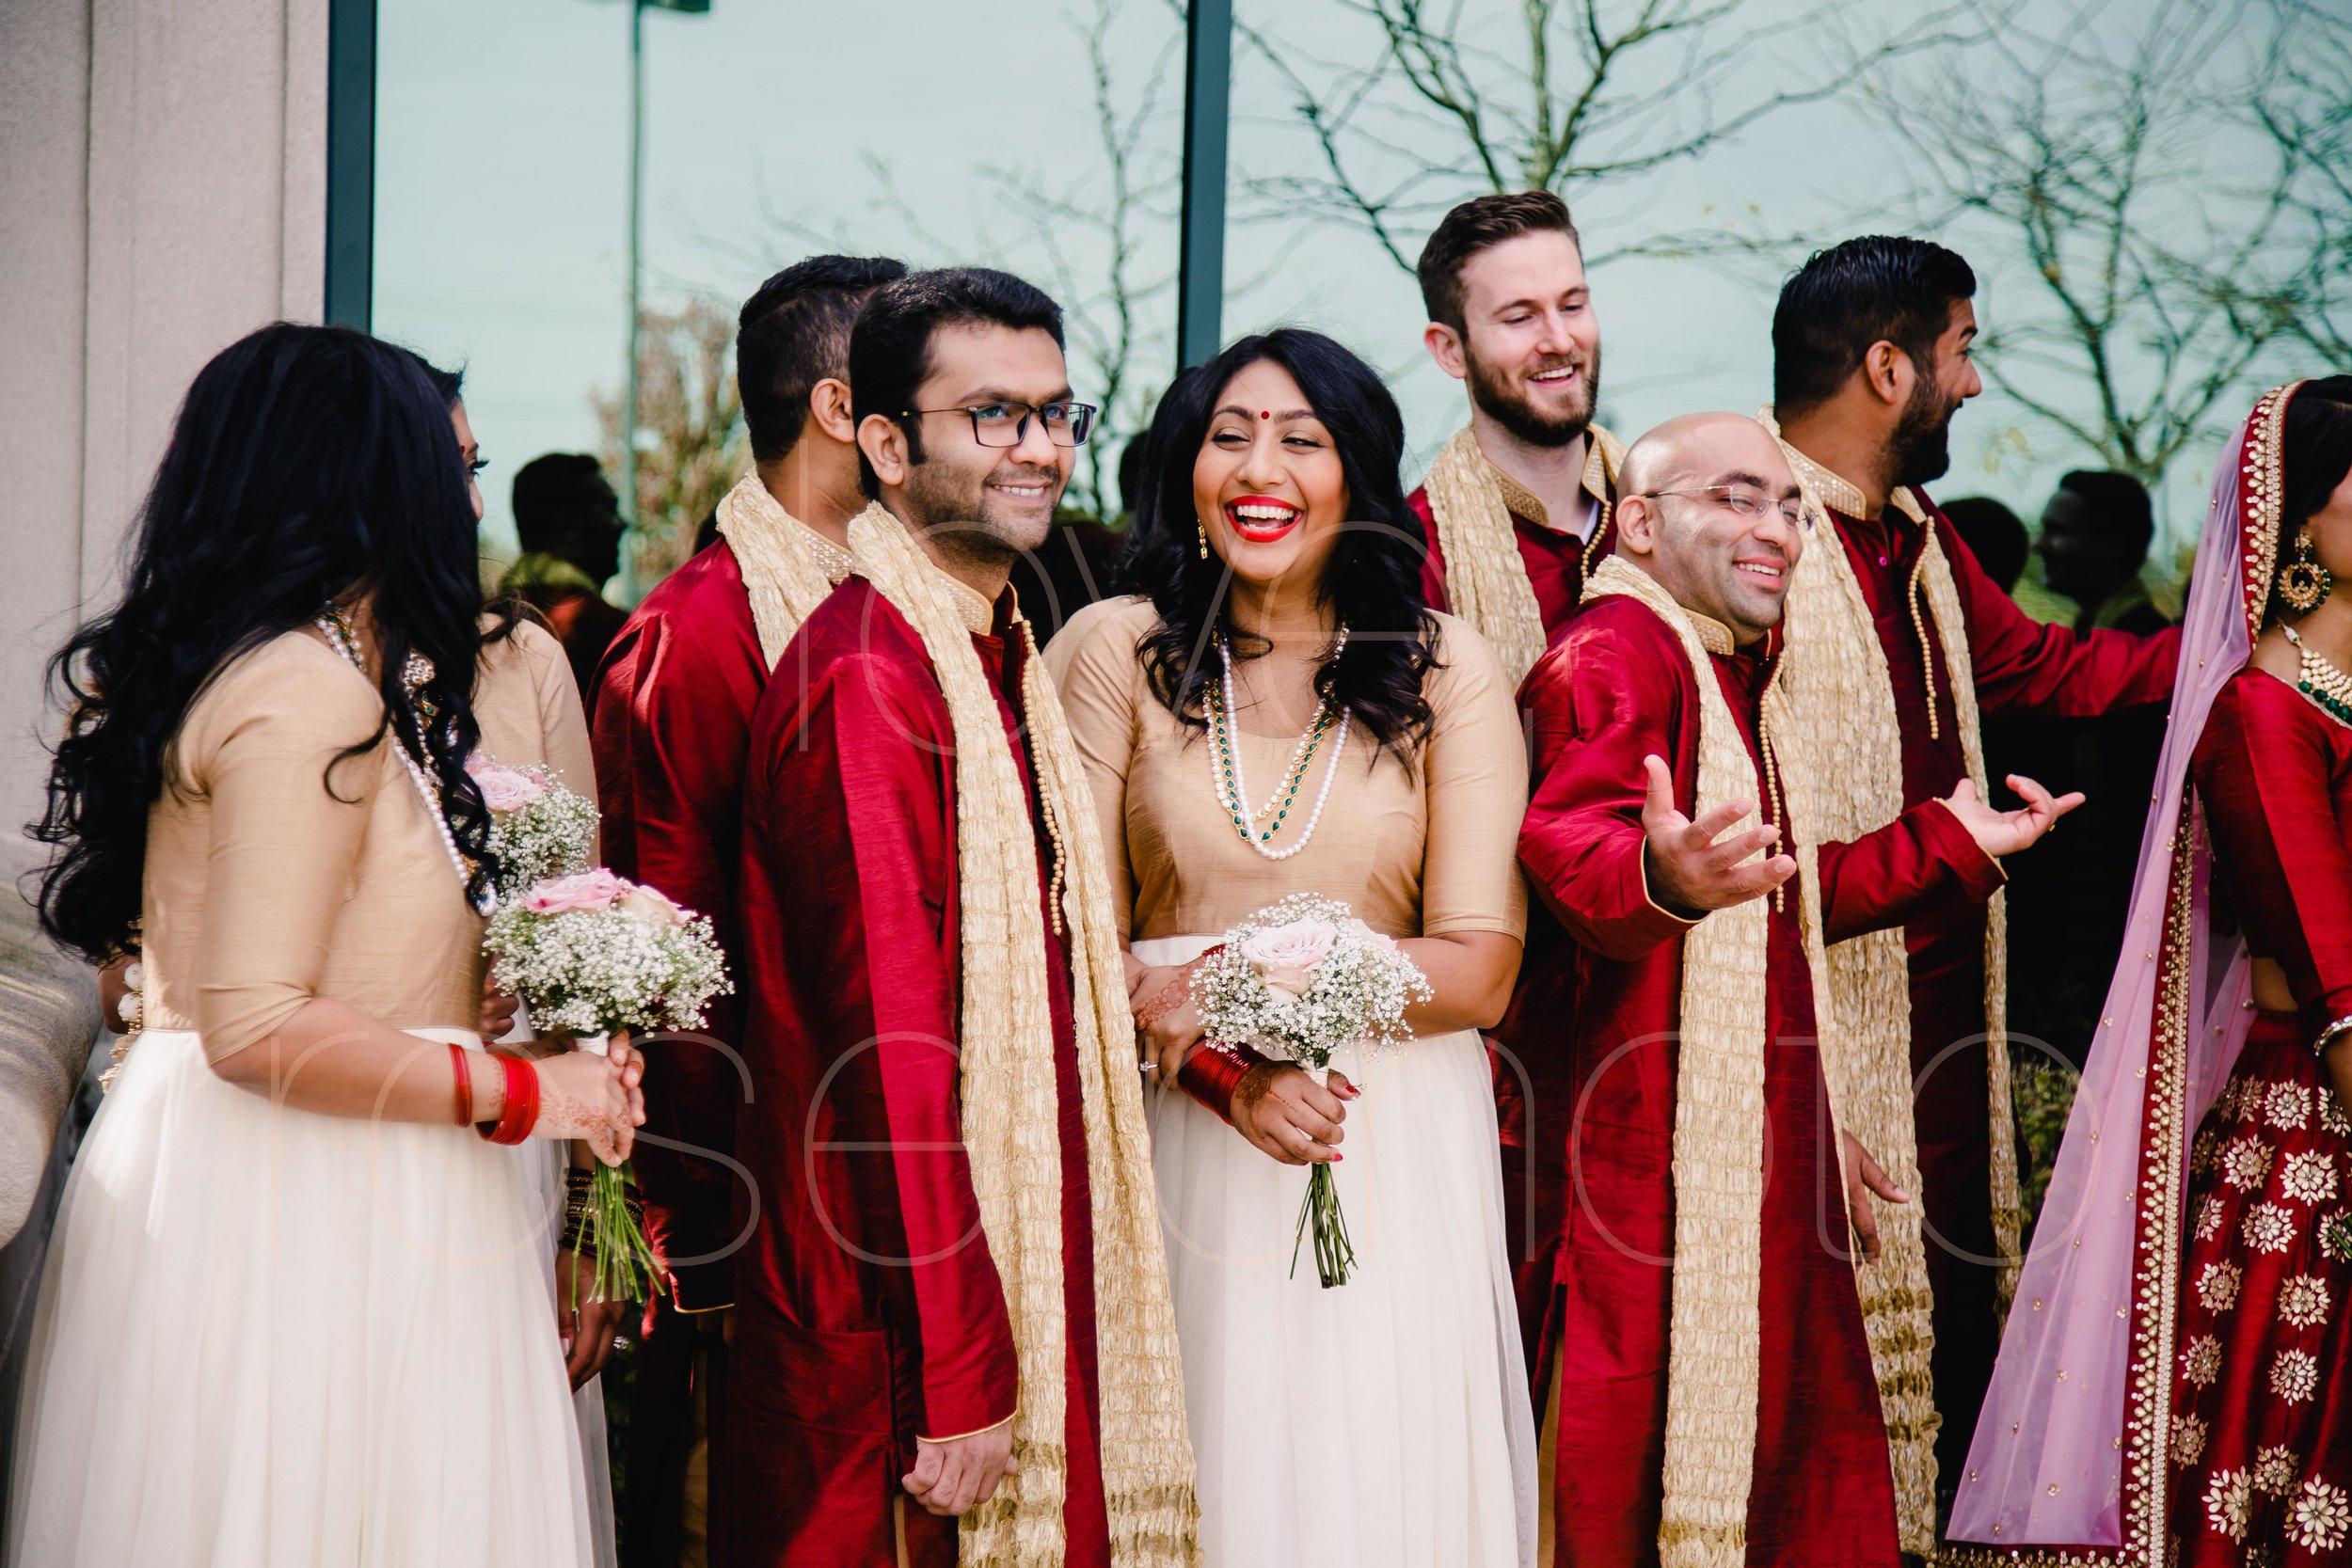 Chicago Indian Wedding best photography lifestyle wedding portrait luxury wedding-12.jpg